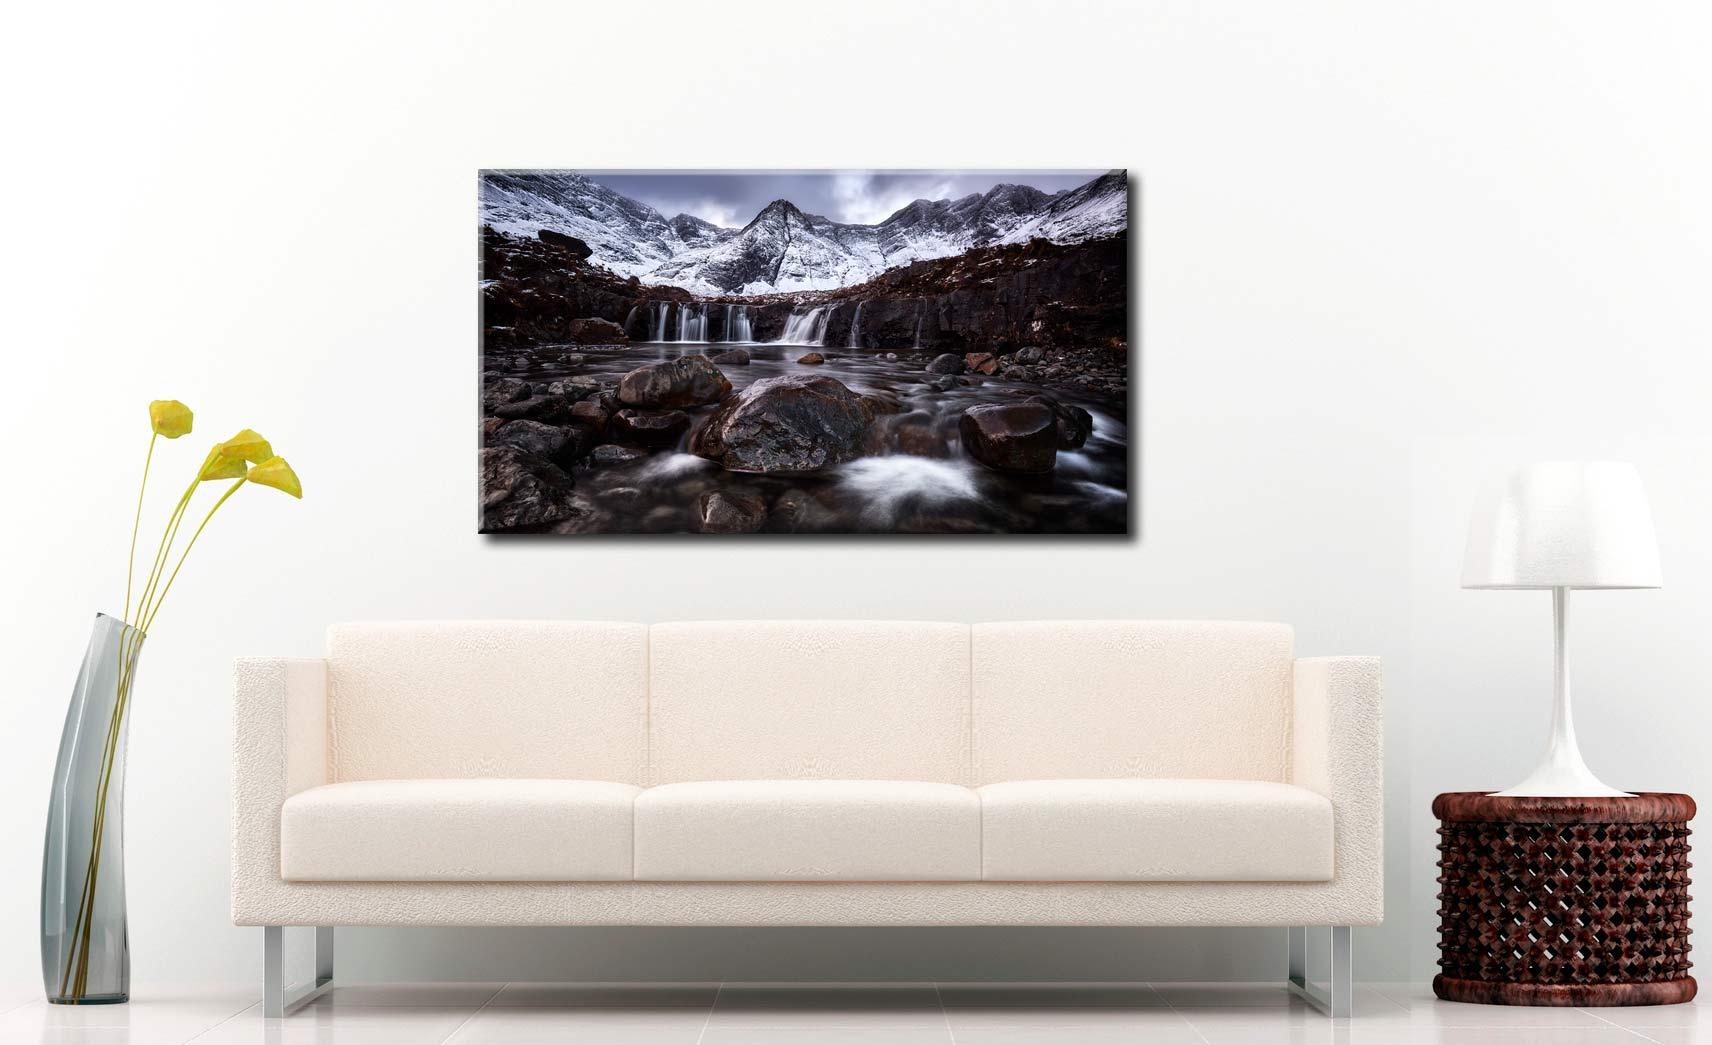 Fairy Pools Rocks Mountains Snow - Canvas Print on Wall